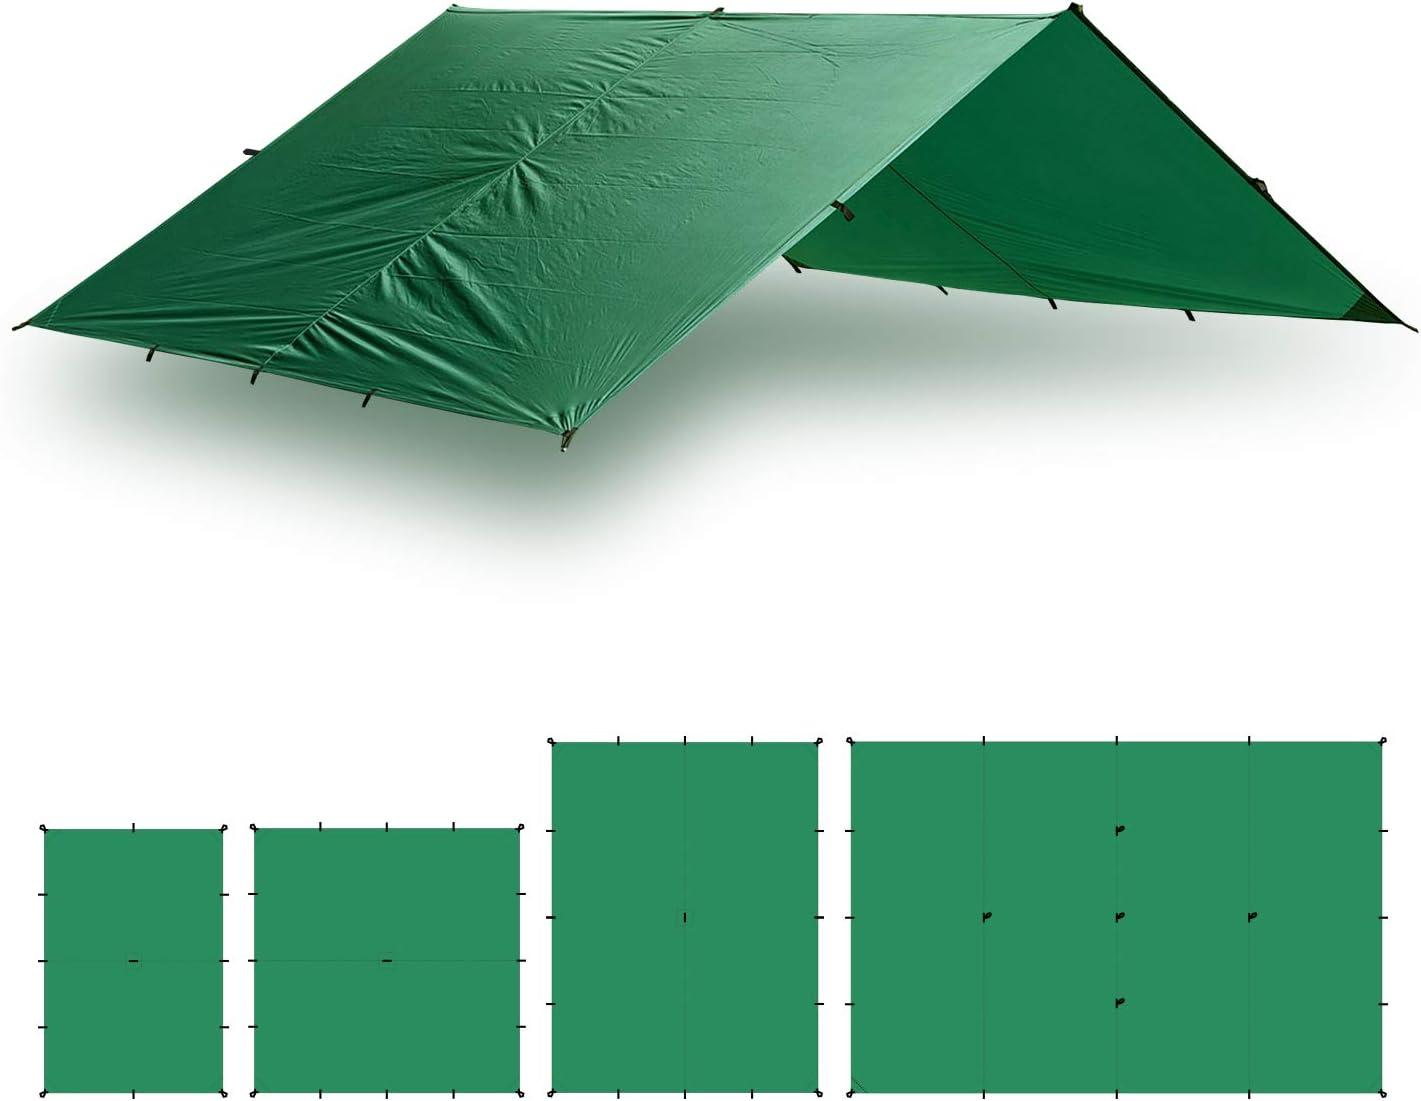 13x10 100/% Waterproof Ultralight Ripstop SilNylon Backpacking Rain Fly 20x13 Green or Olive Drab Aqua Quest Guide Camping Tarp 10x10 10x7